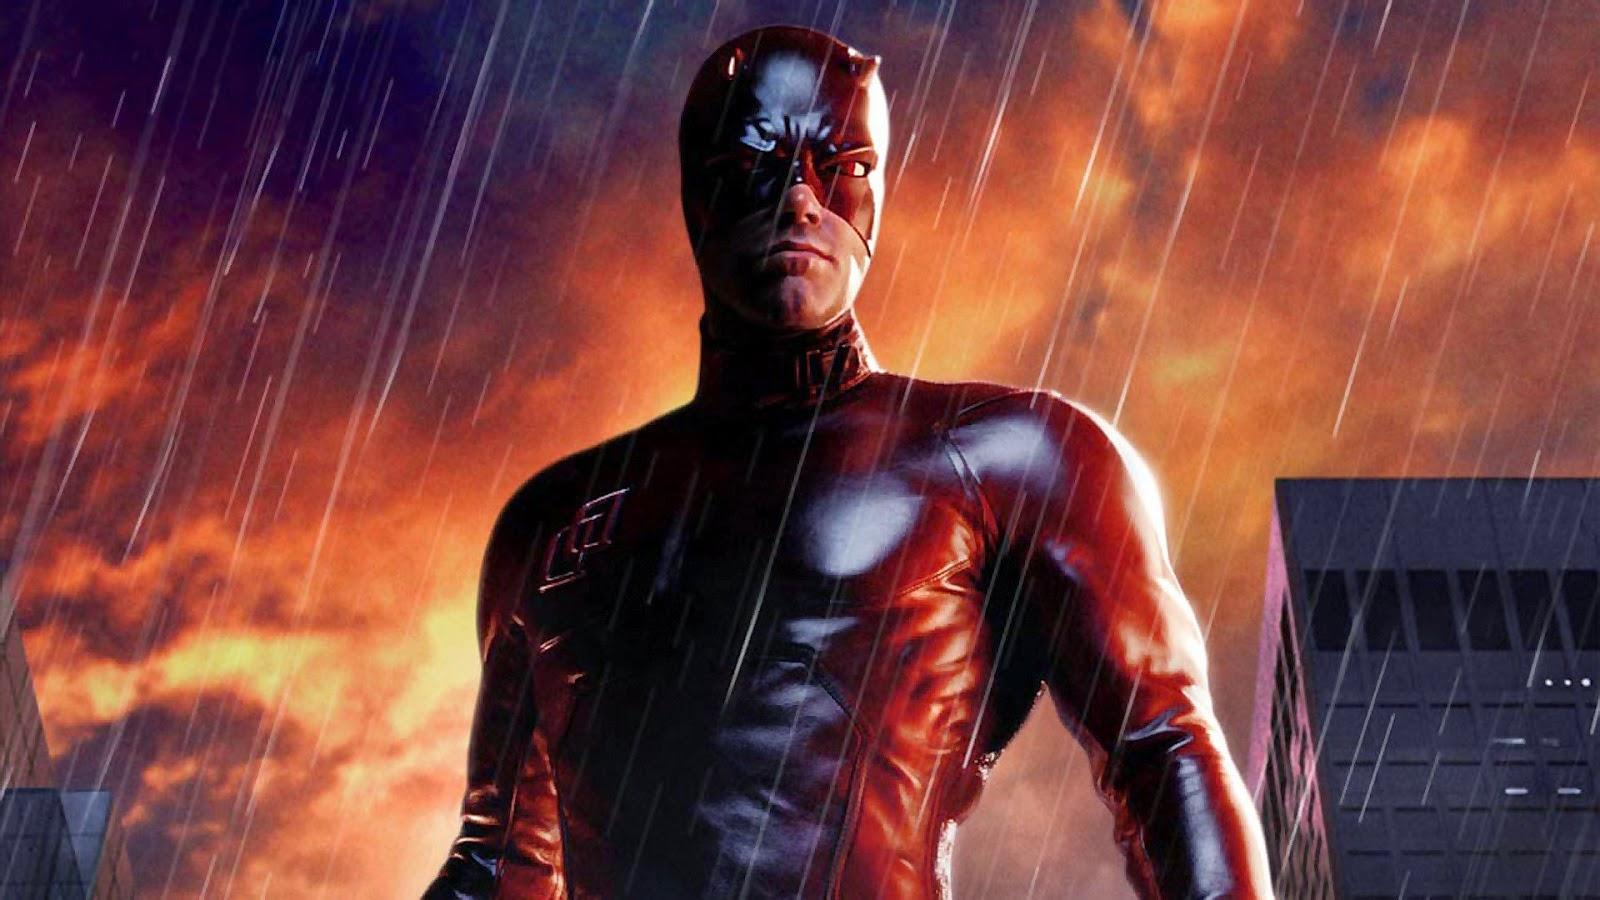 Daredevil Netflix HD Wallpapers